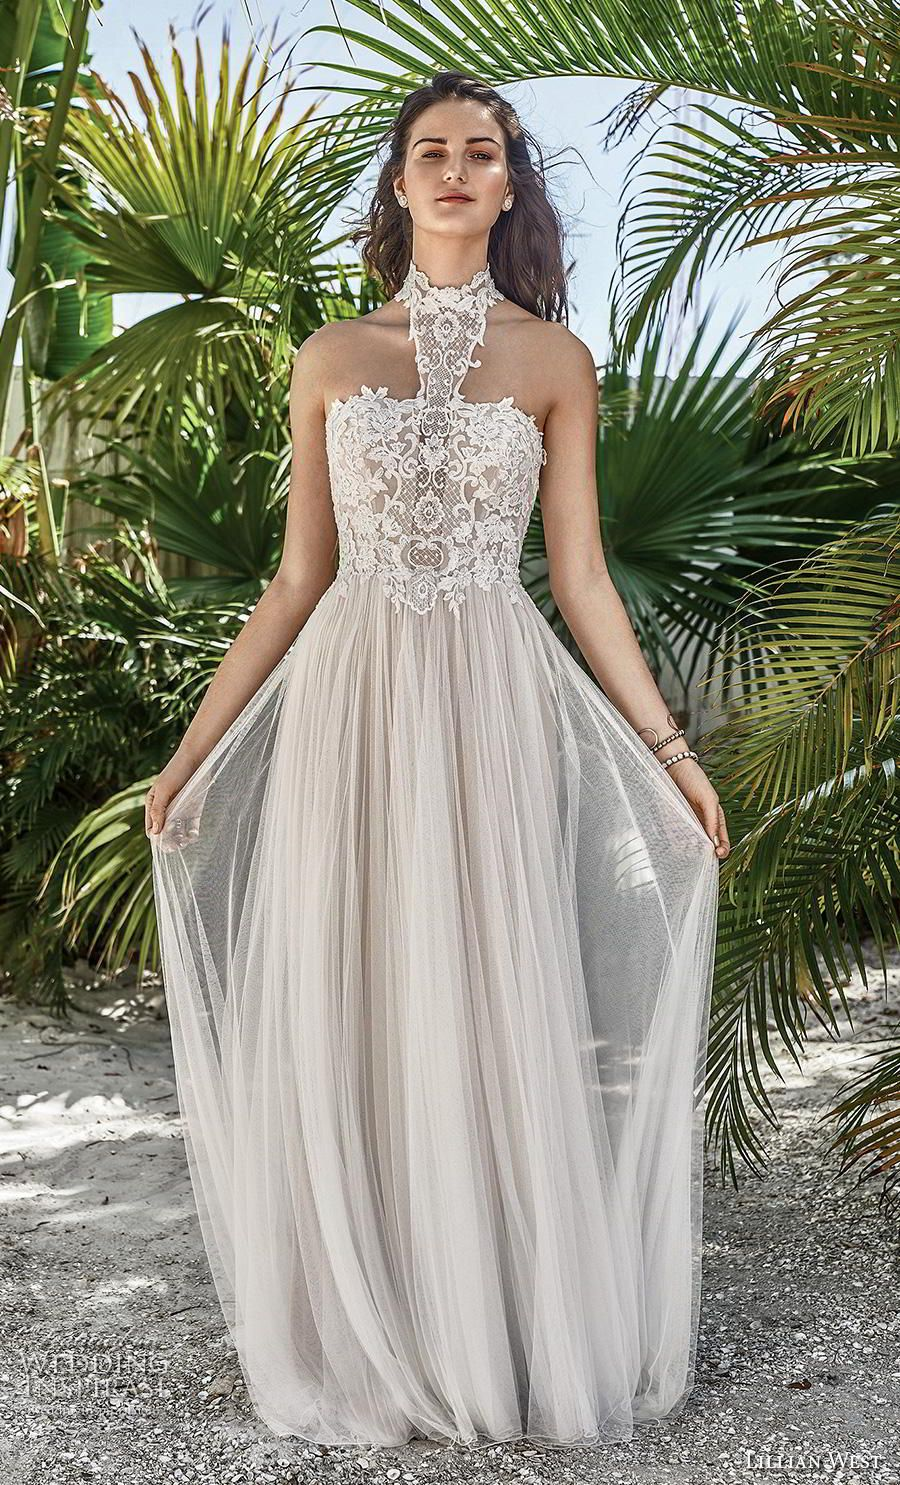 Lillian west wedding dress  Lillian West Spring  Wedding Dresses  Lillian West  Pinterest